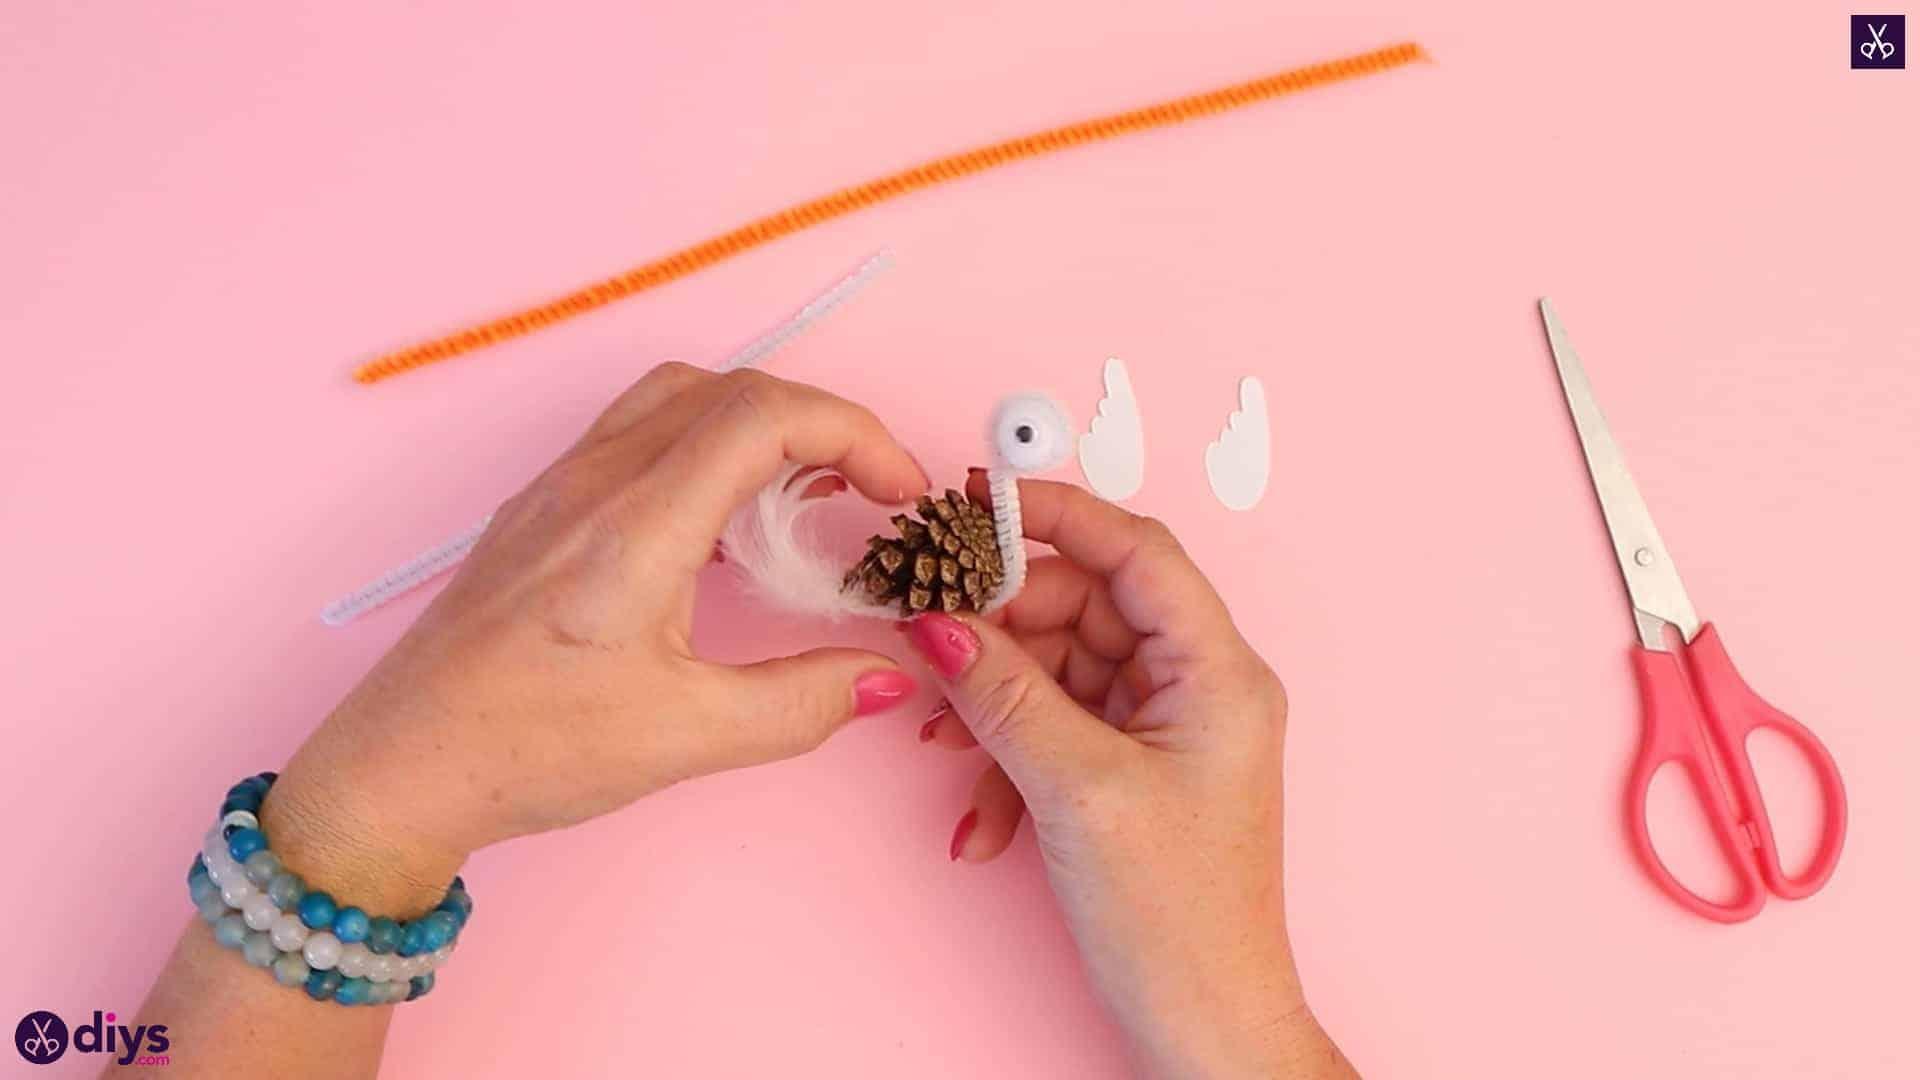 Diy simple pinecone swan step6a